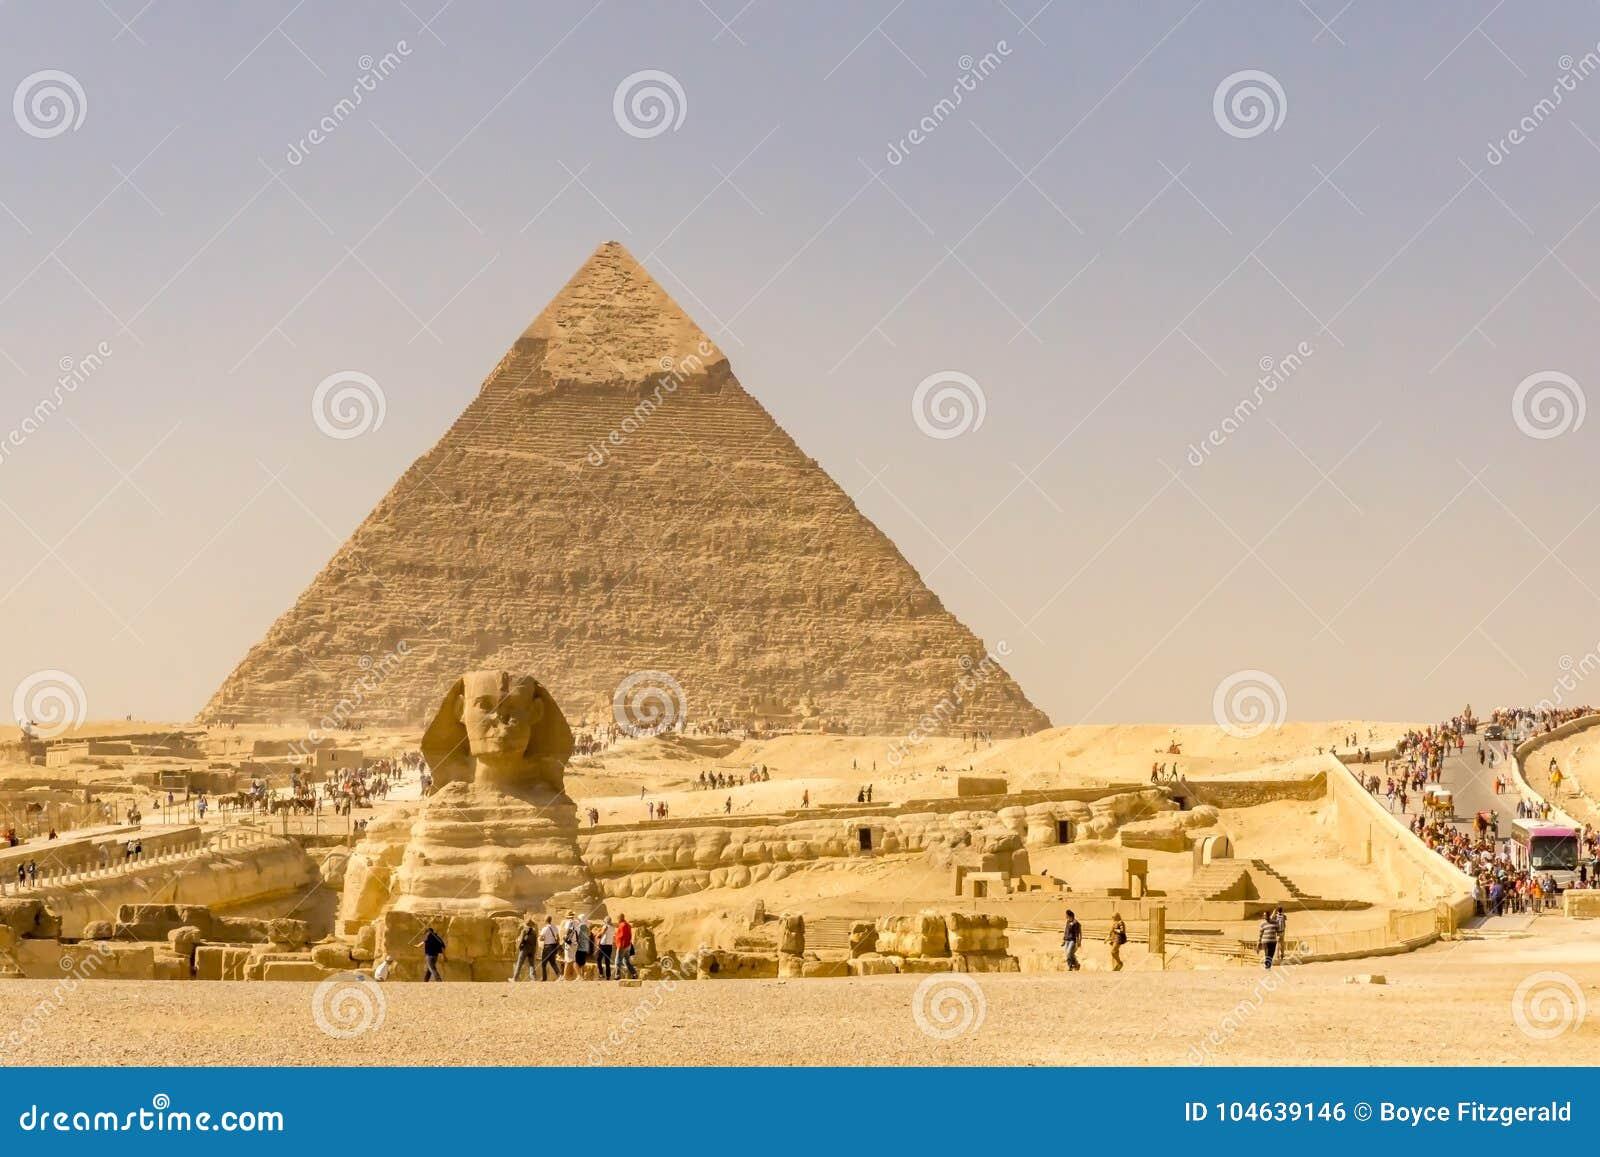 Landscape of the pyramids in Giza, Egypt